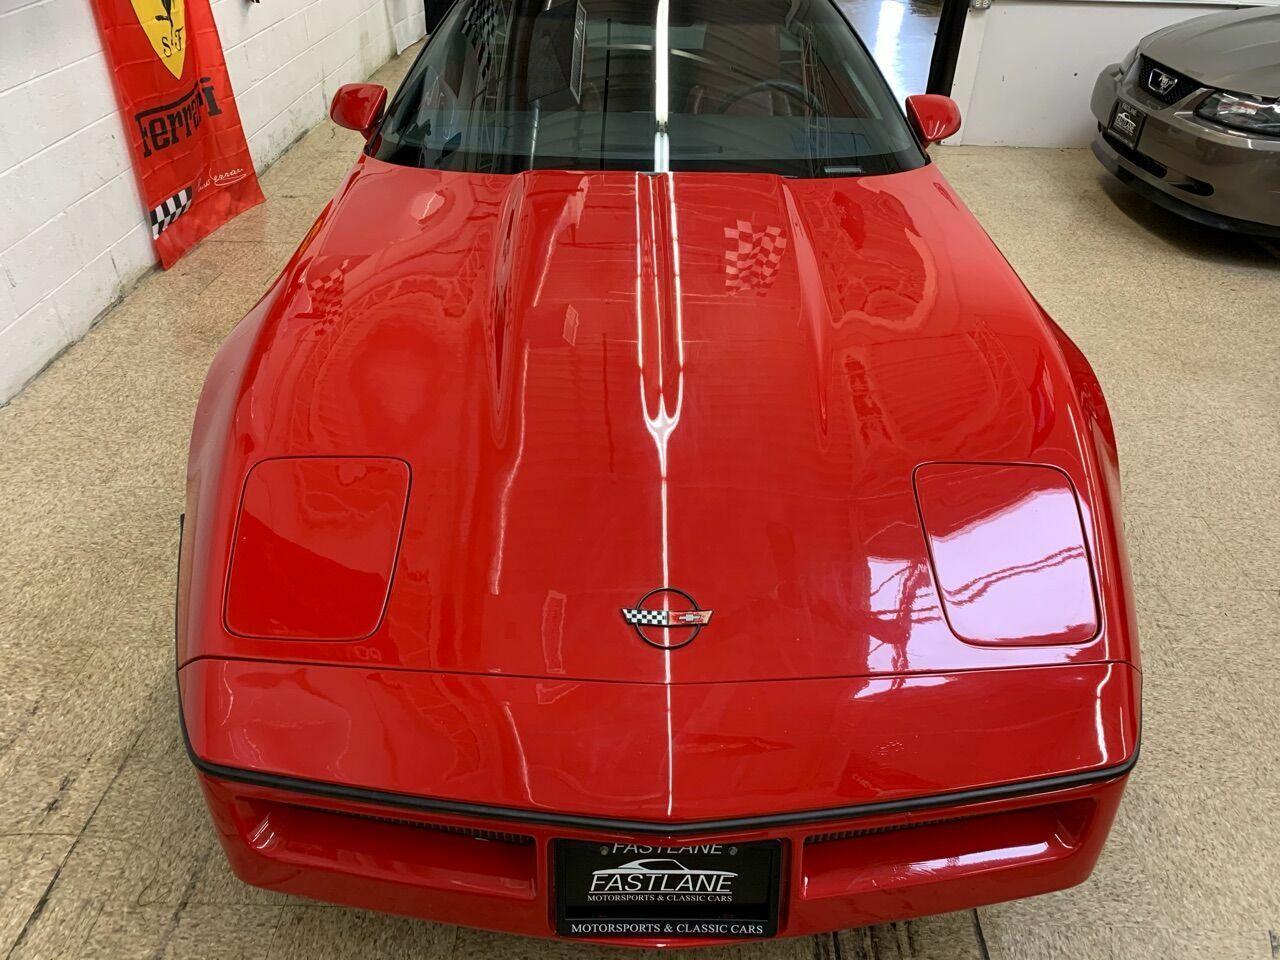 1986 Red Chevrolet Corvette   | C4 Corvette Photo 4